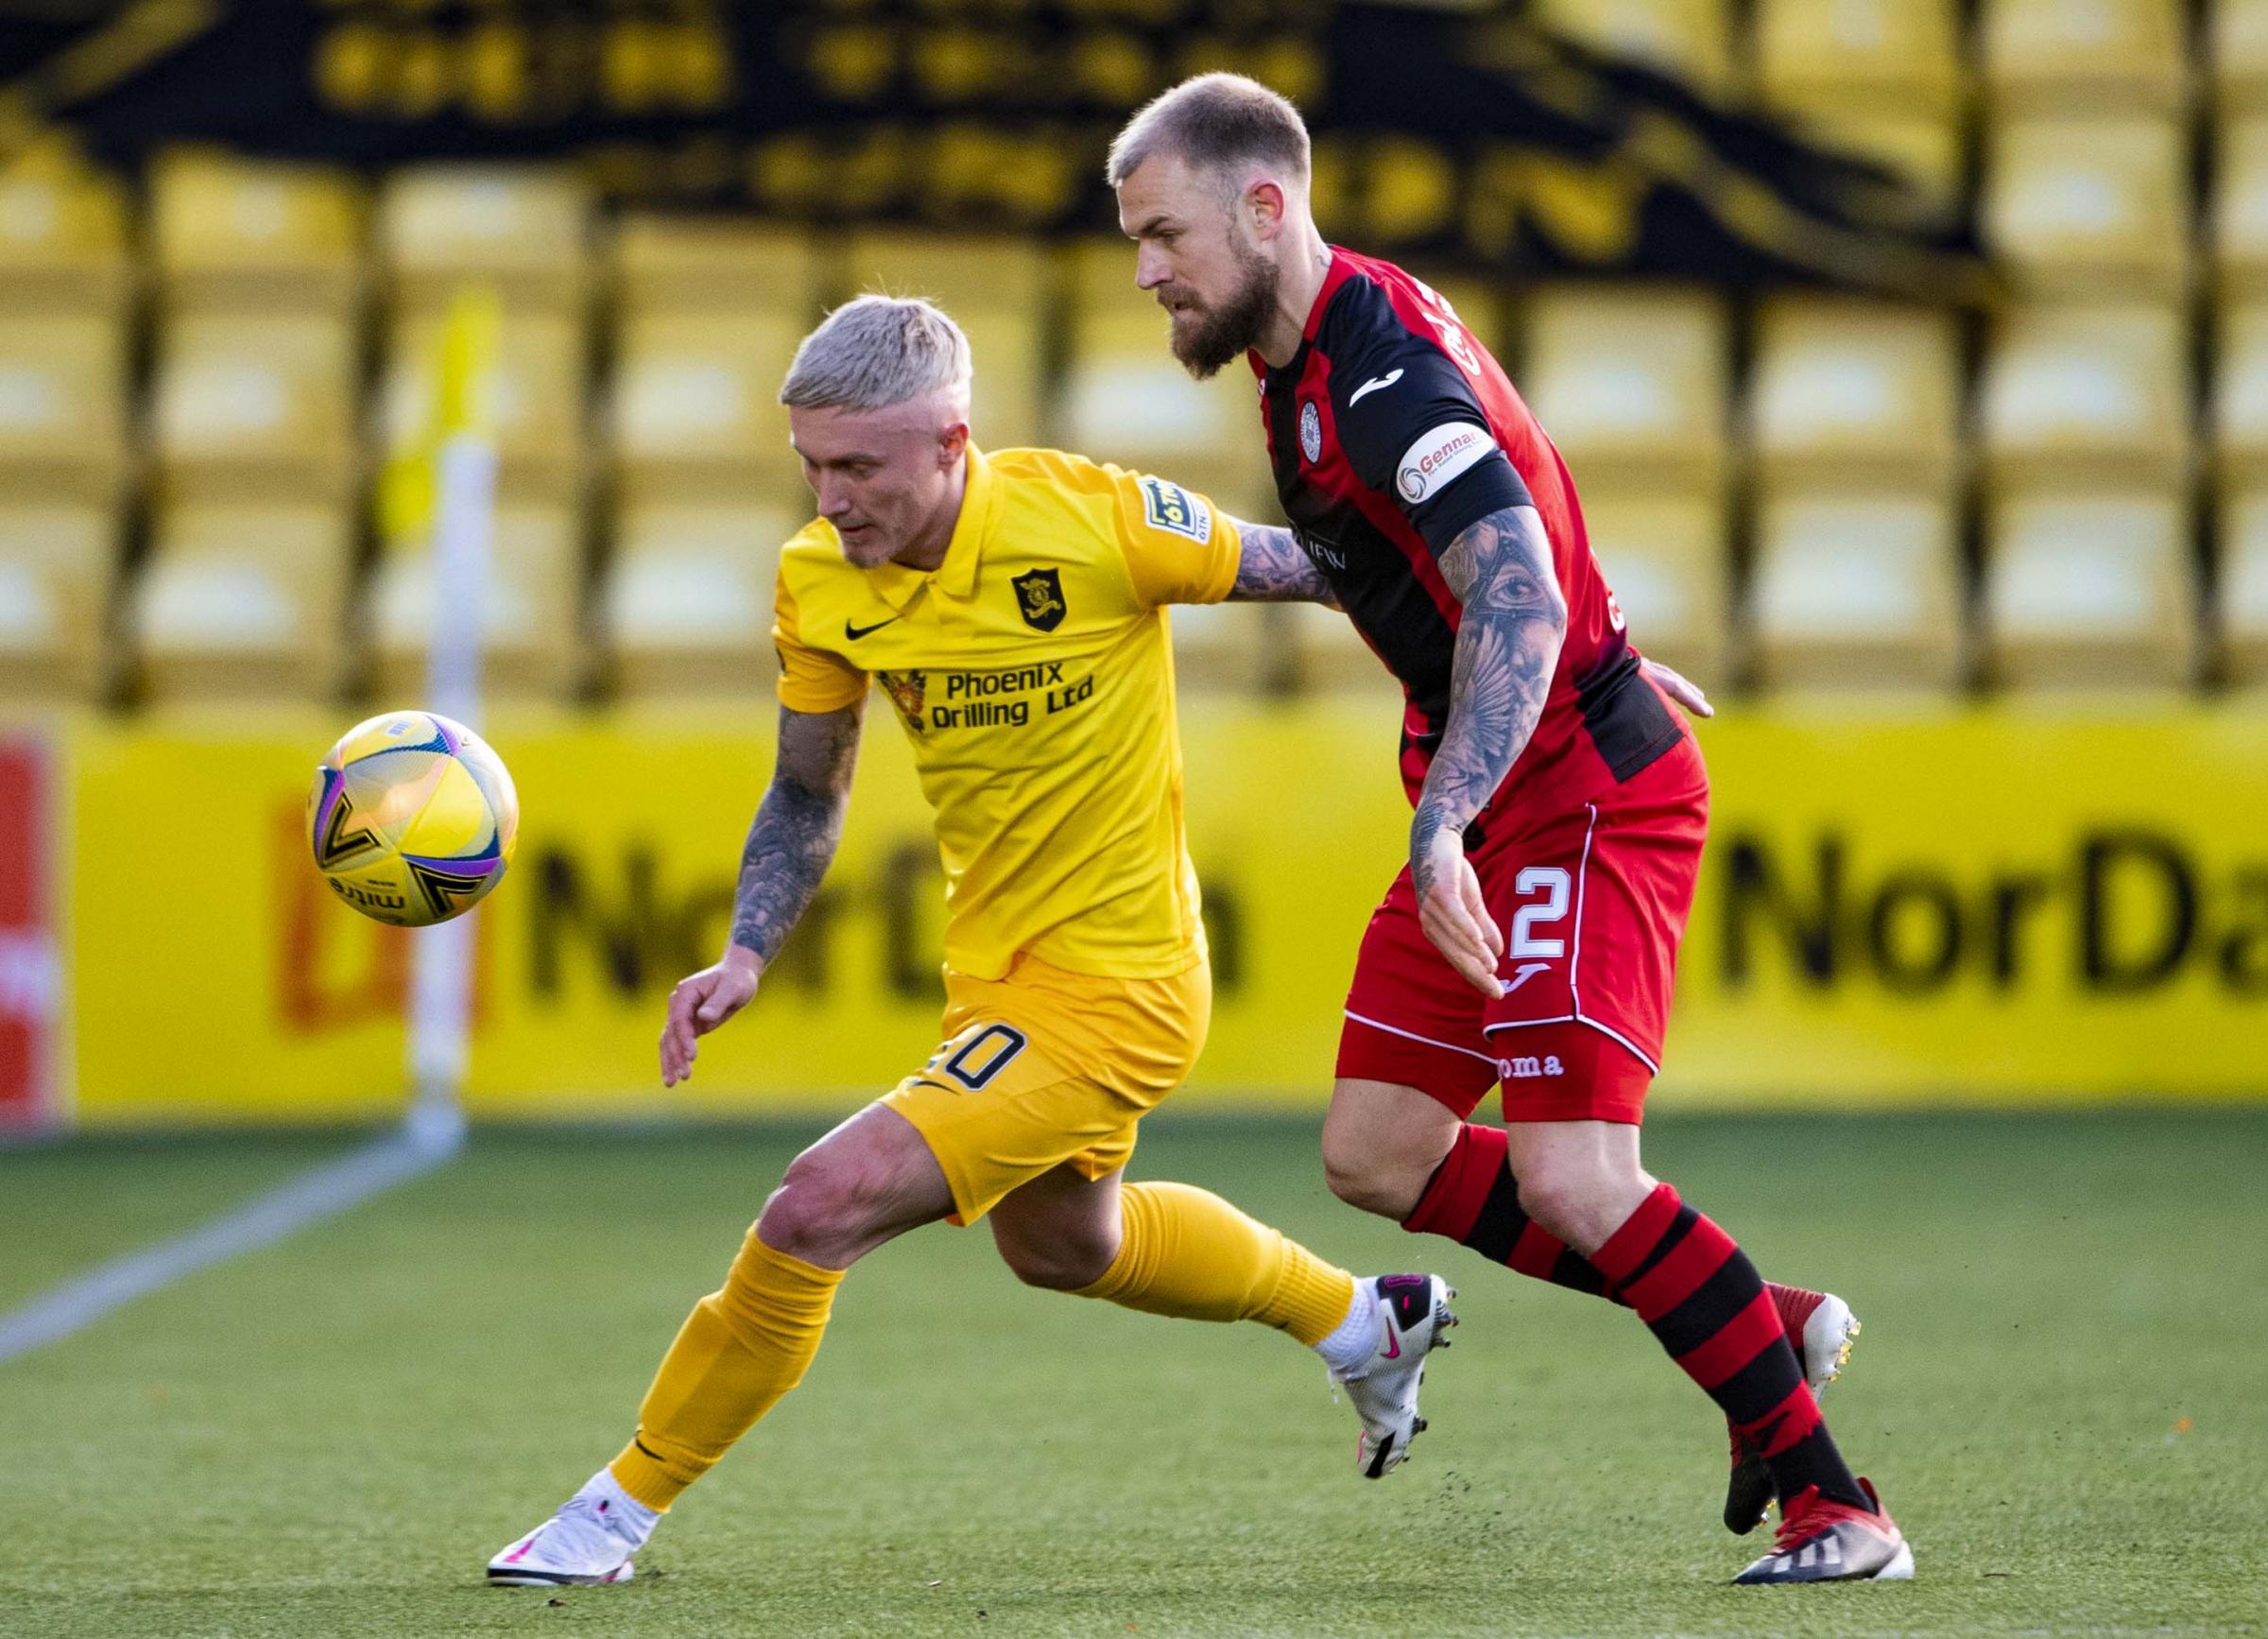 Livingston vs St Mirren live stream: How to watch Betfred Cup semi-final showdown